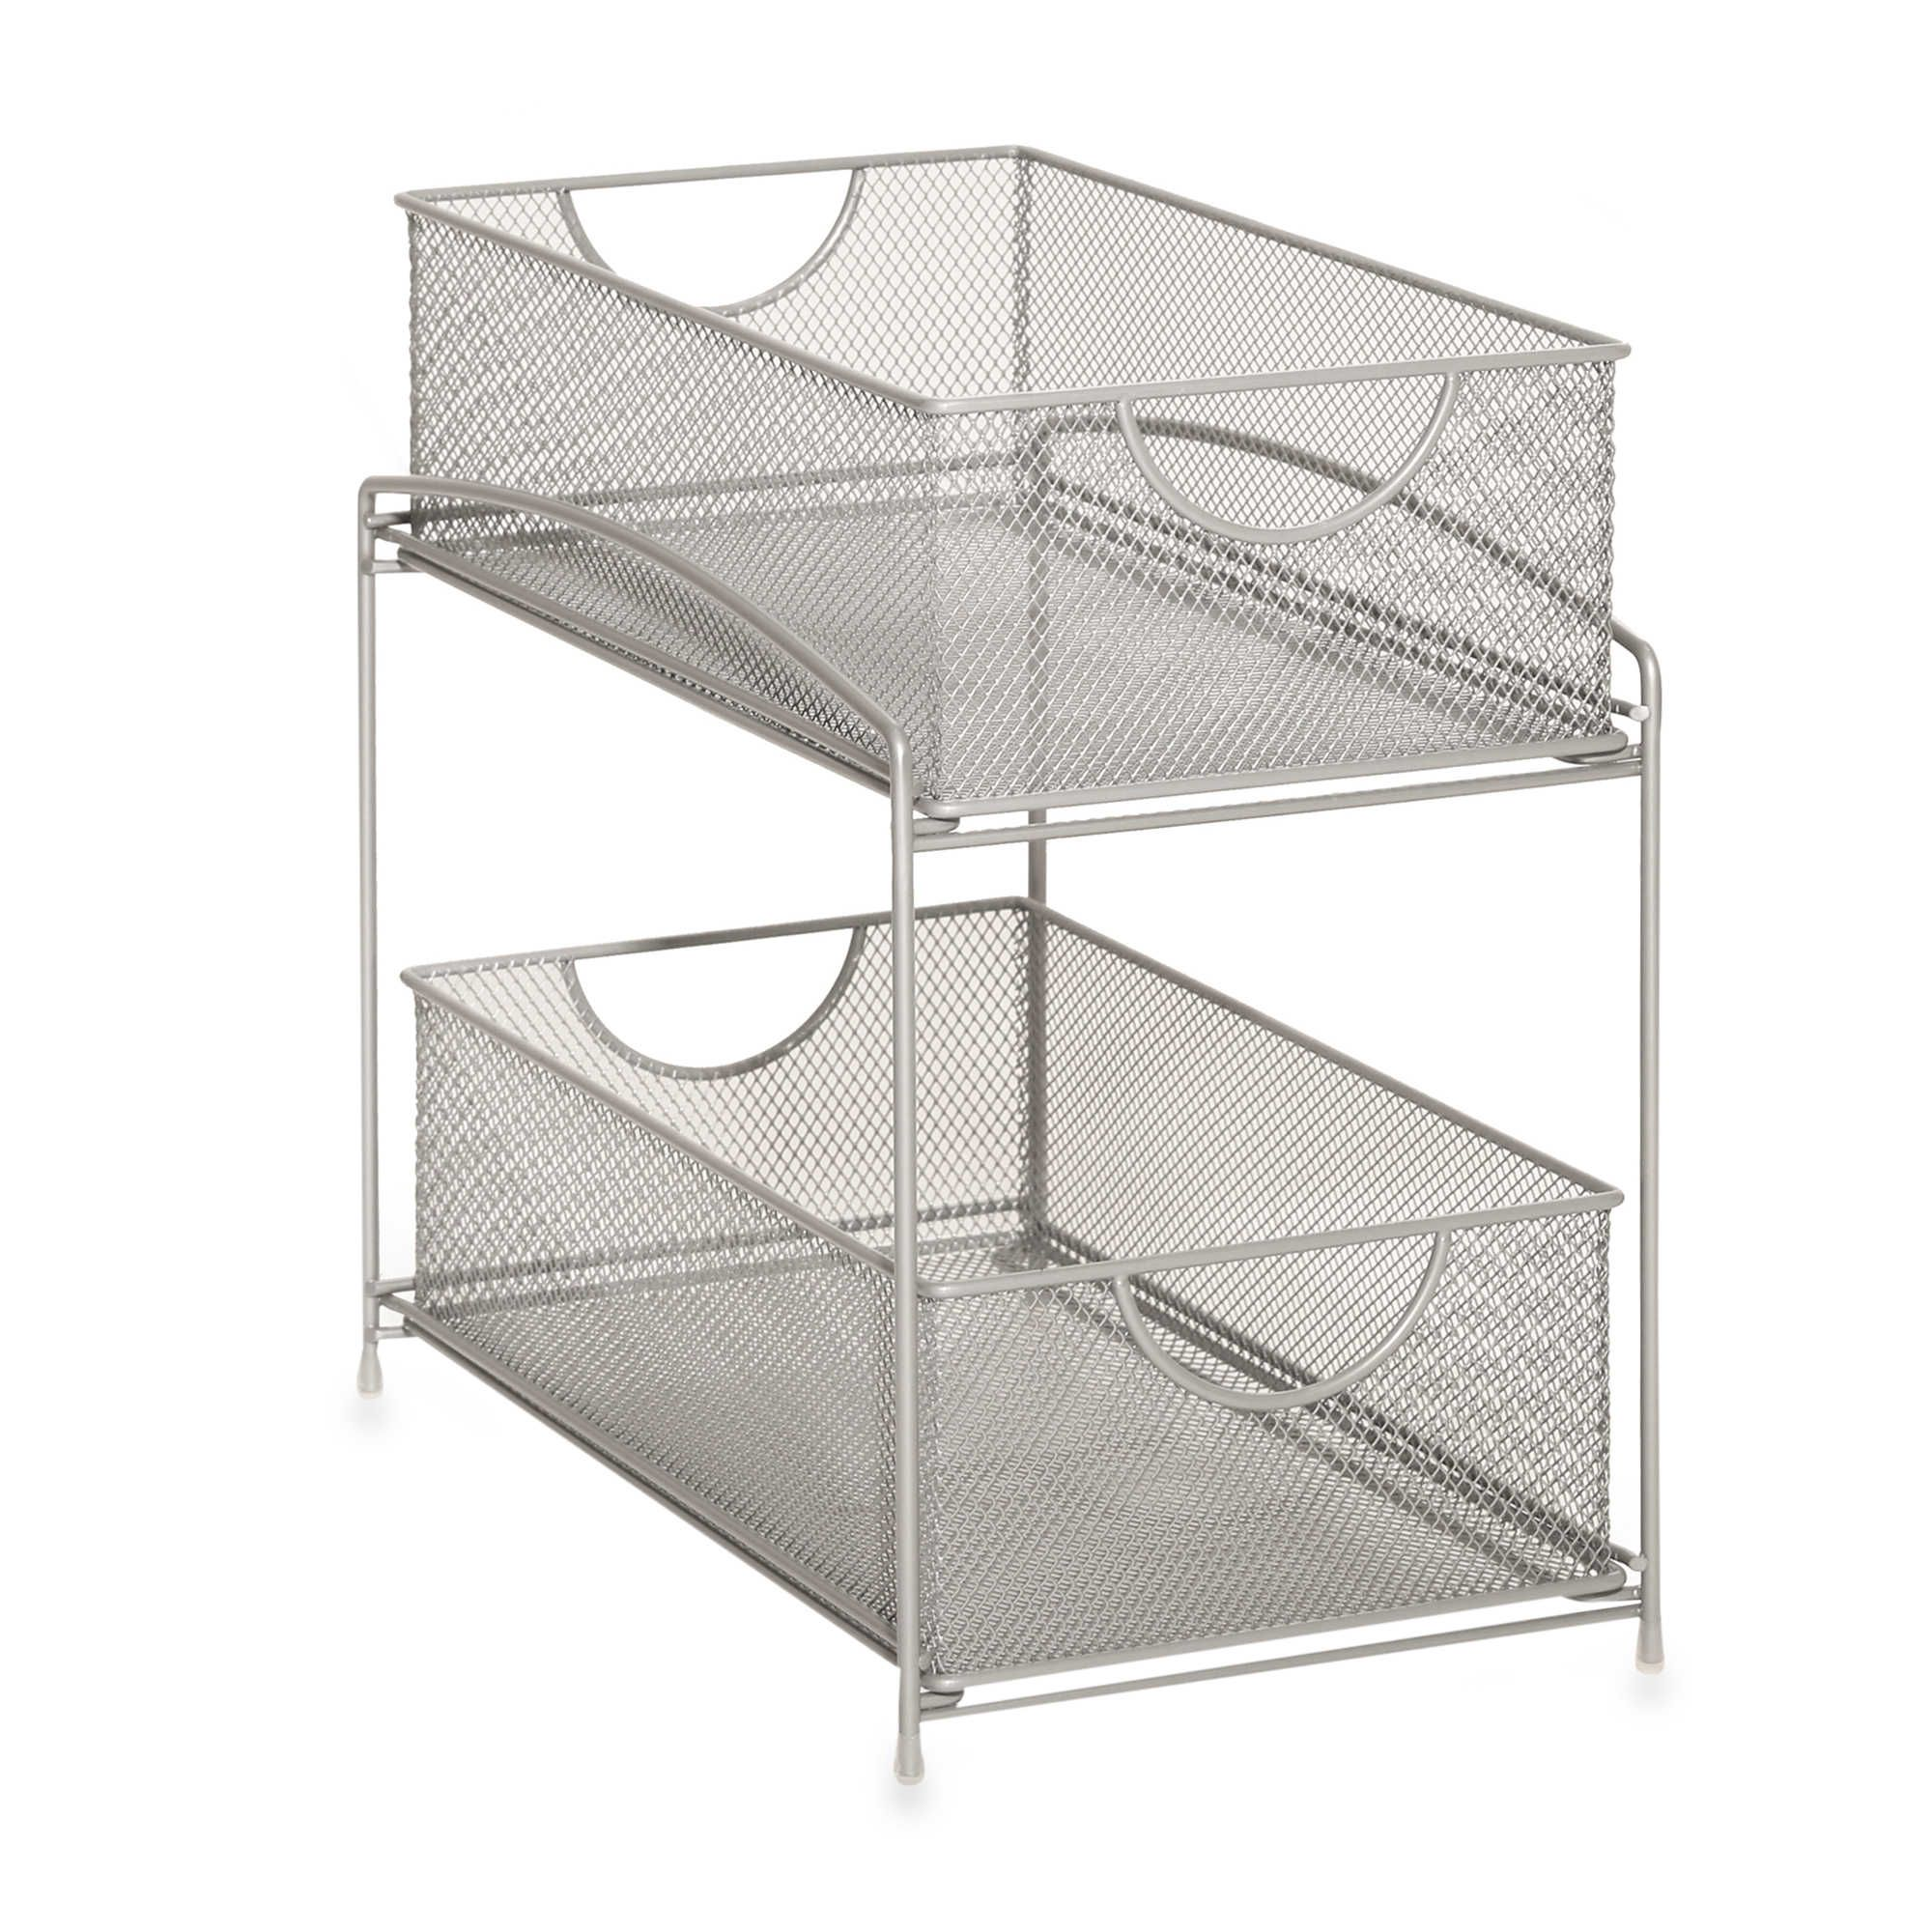 ORG 2-Tier Mesh Double Sliding Cabinet Basket in Silver | bathroom ...